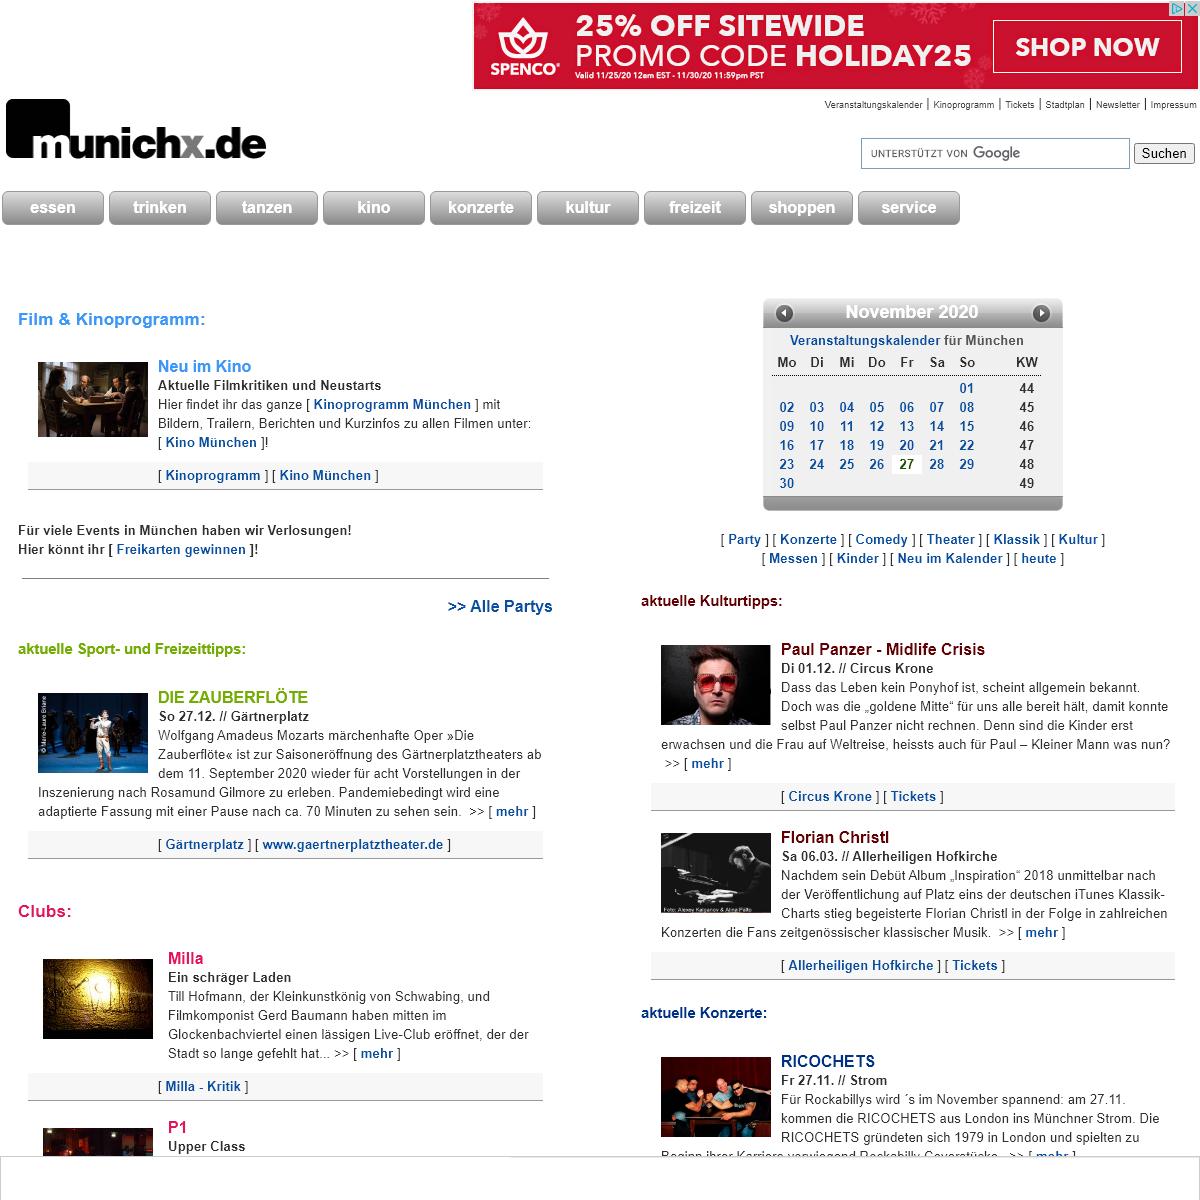 munichx - Stadtmagazin München- Kino, Party, Konzert, Tickets, Singles, Flirten